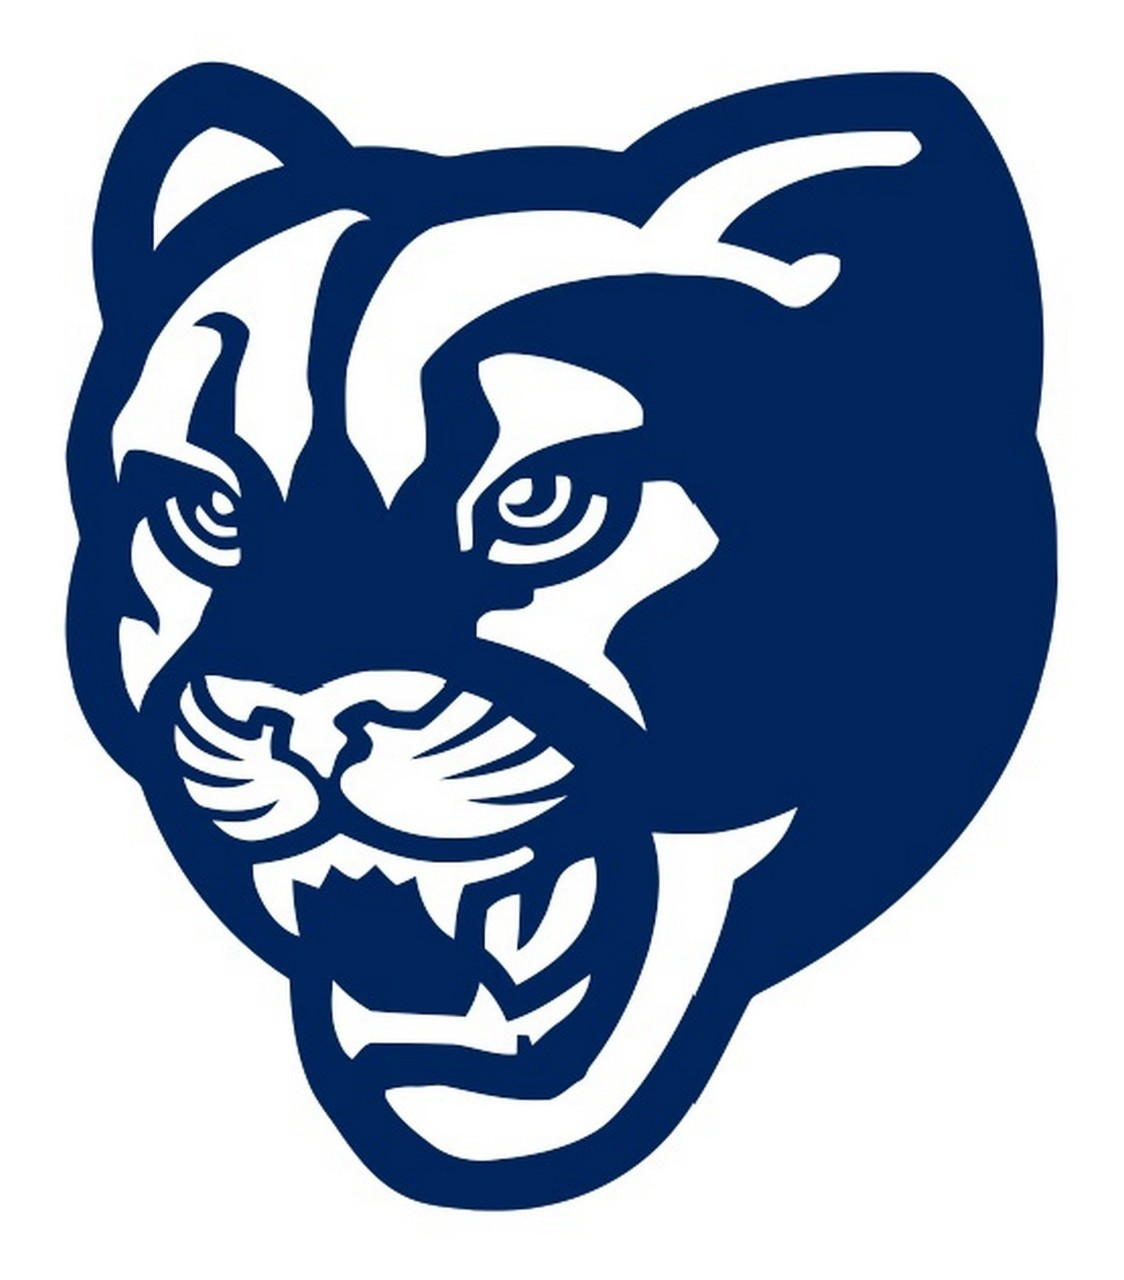 ncaa0664 BYU Cougars old school logo Die Cut Vinyl Graphic Decal Sticker  NCAA.